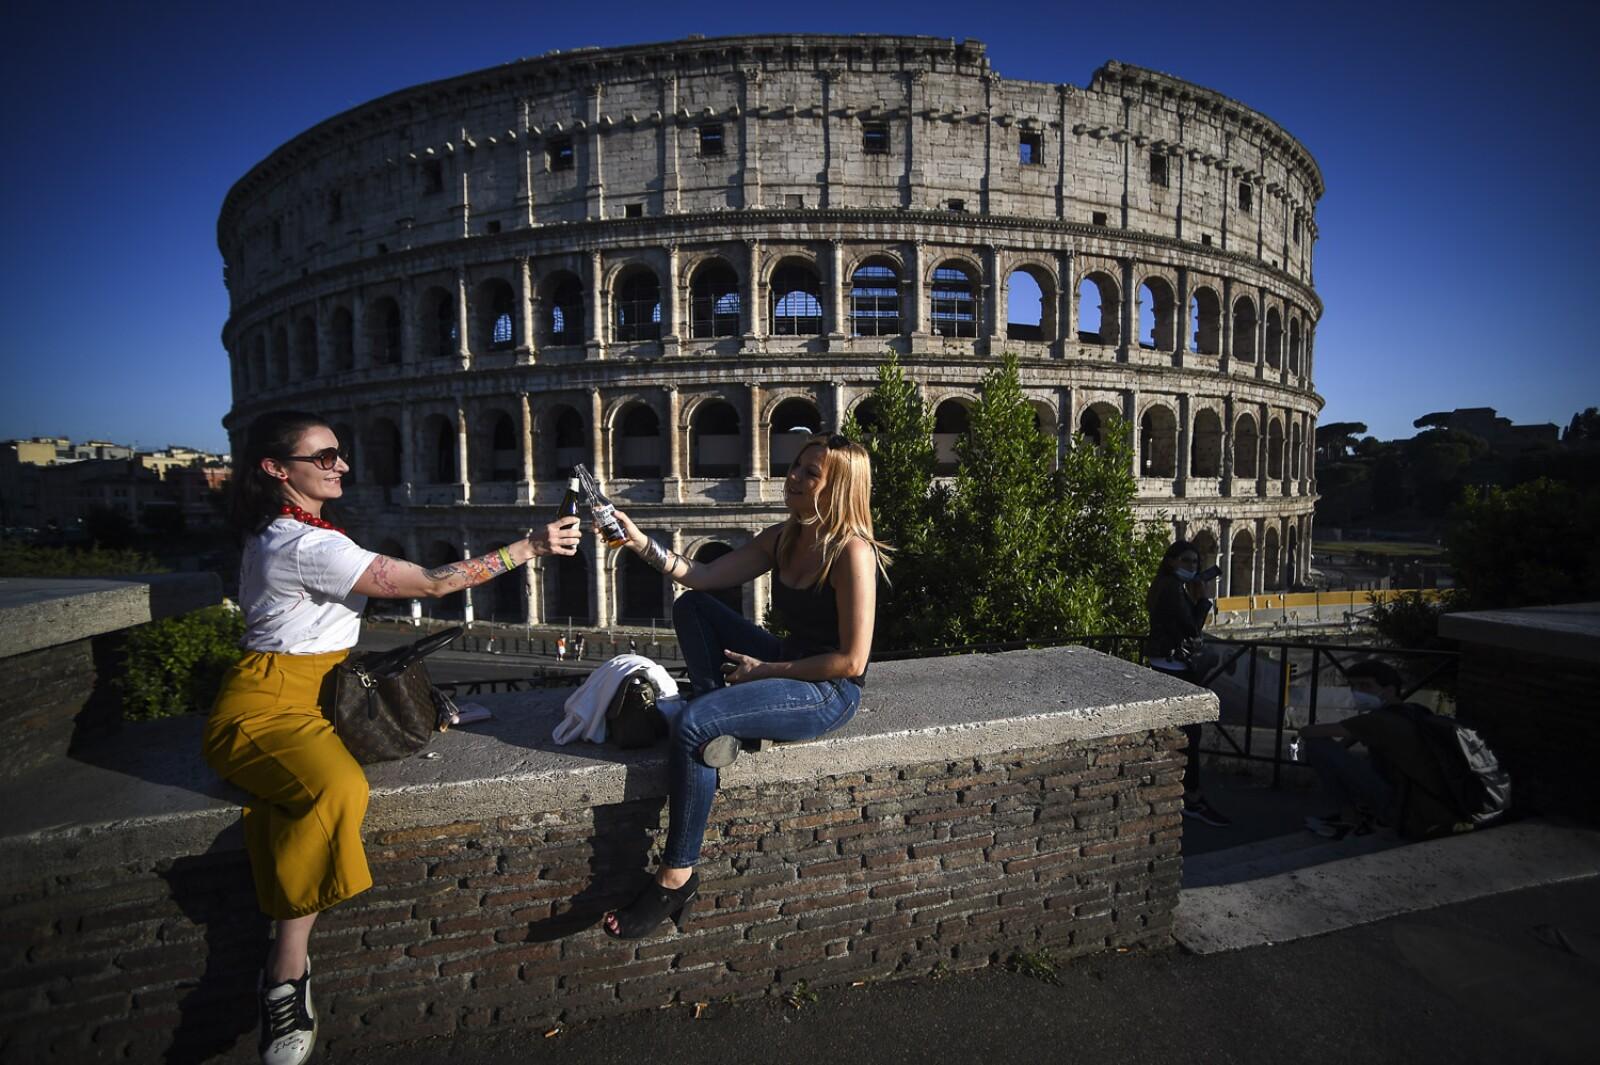 ITALY-HEALTH-VIRUS-NIGHTLIFE